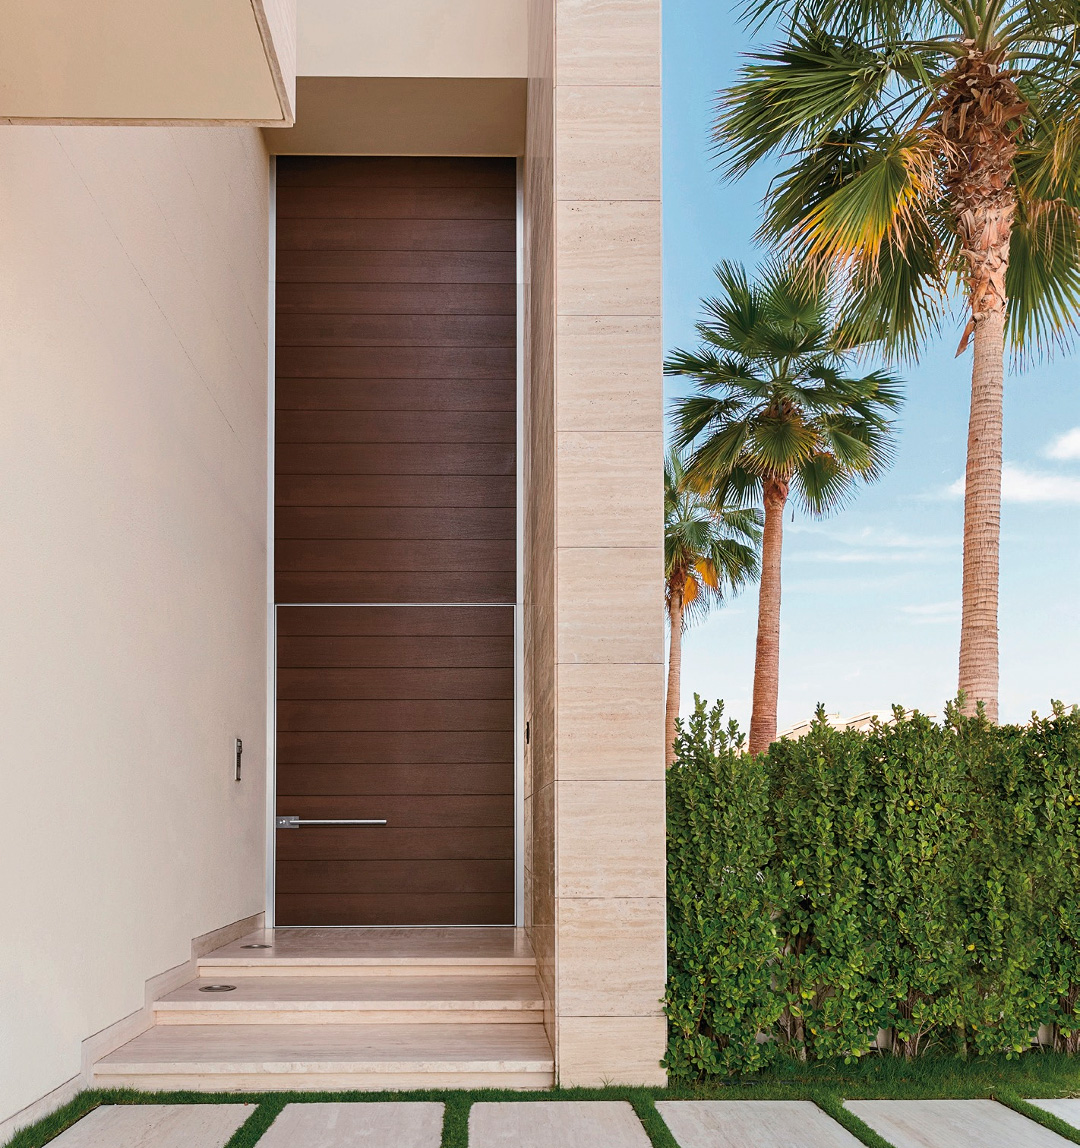 puerta blindada altura personalizada Synua de Oikos